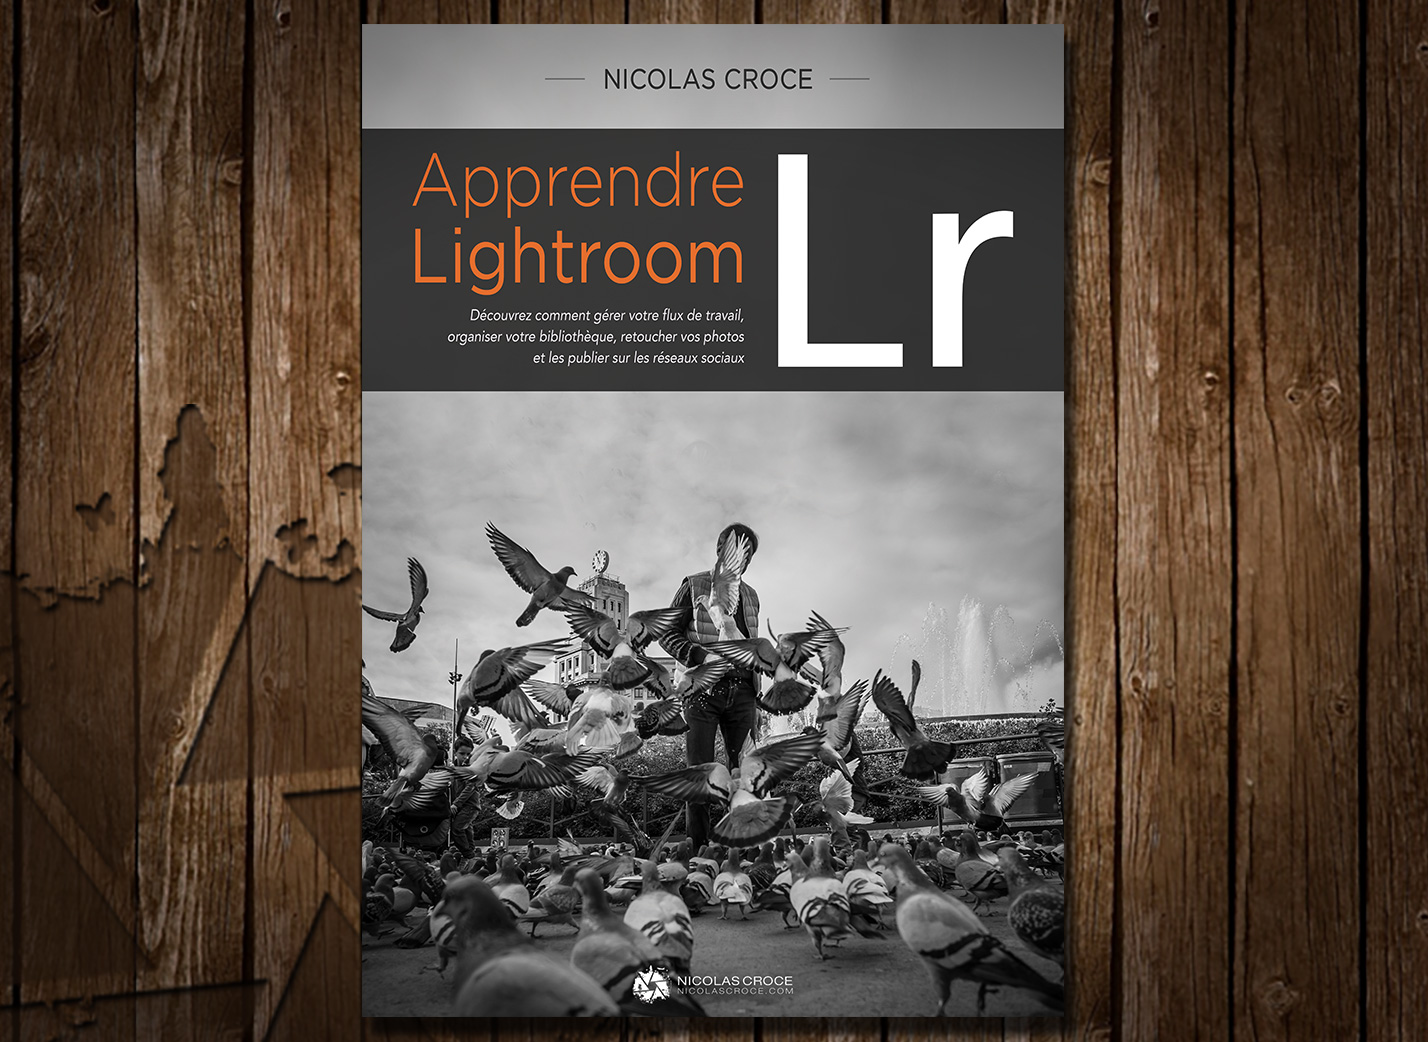 apprendre-lightroom-ebook-featured